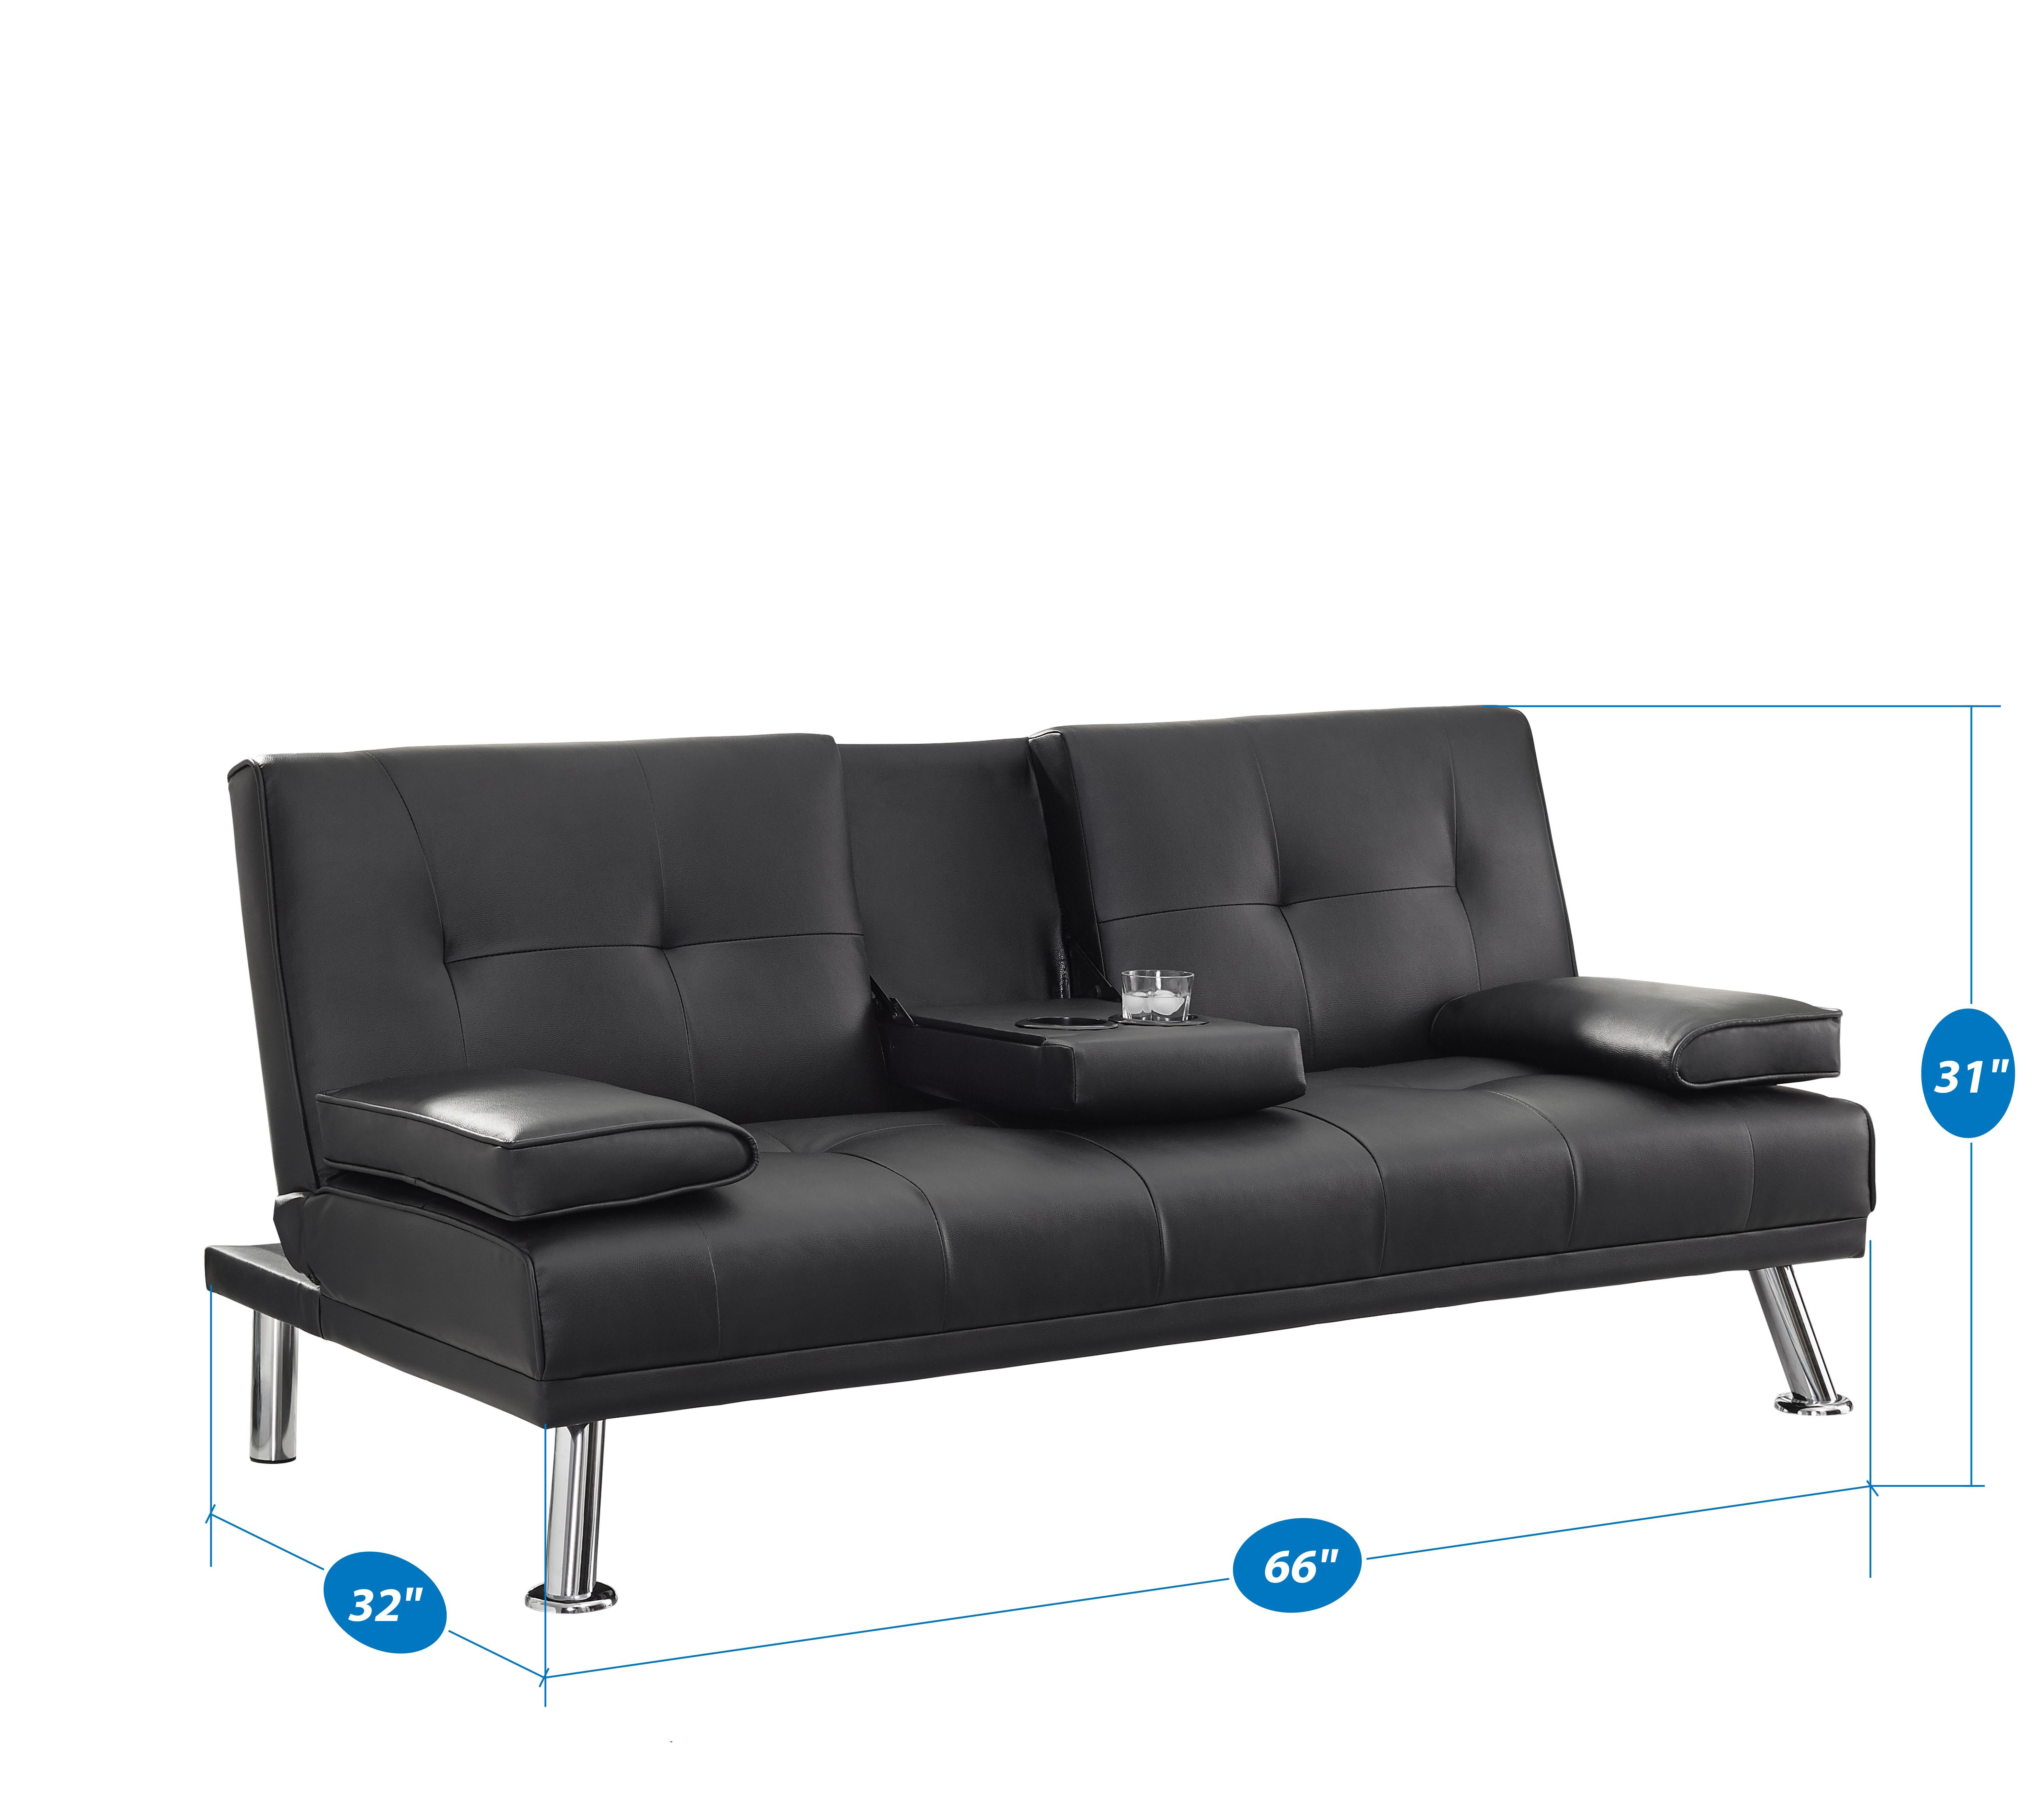 low priced 46a84 30073 Naomi Home Futon Sofa Bed with Armrest, Espresso